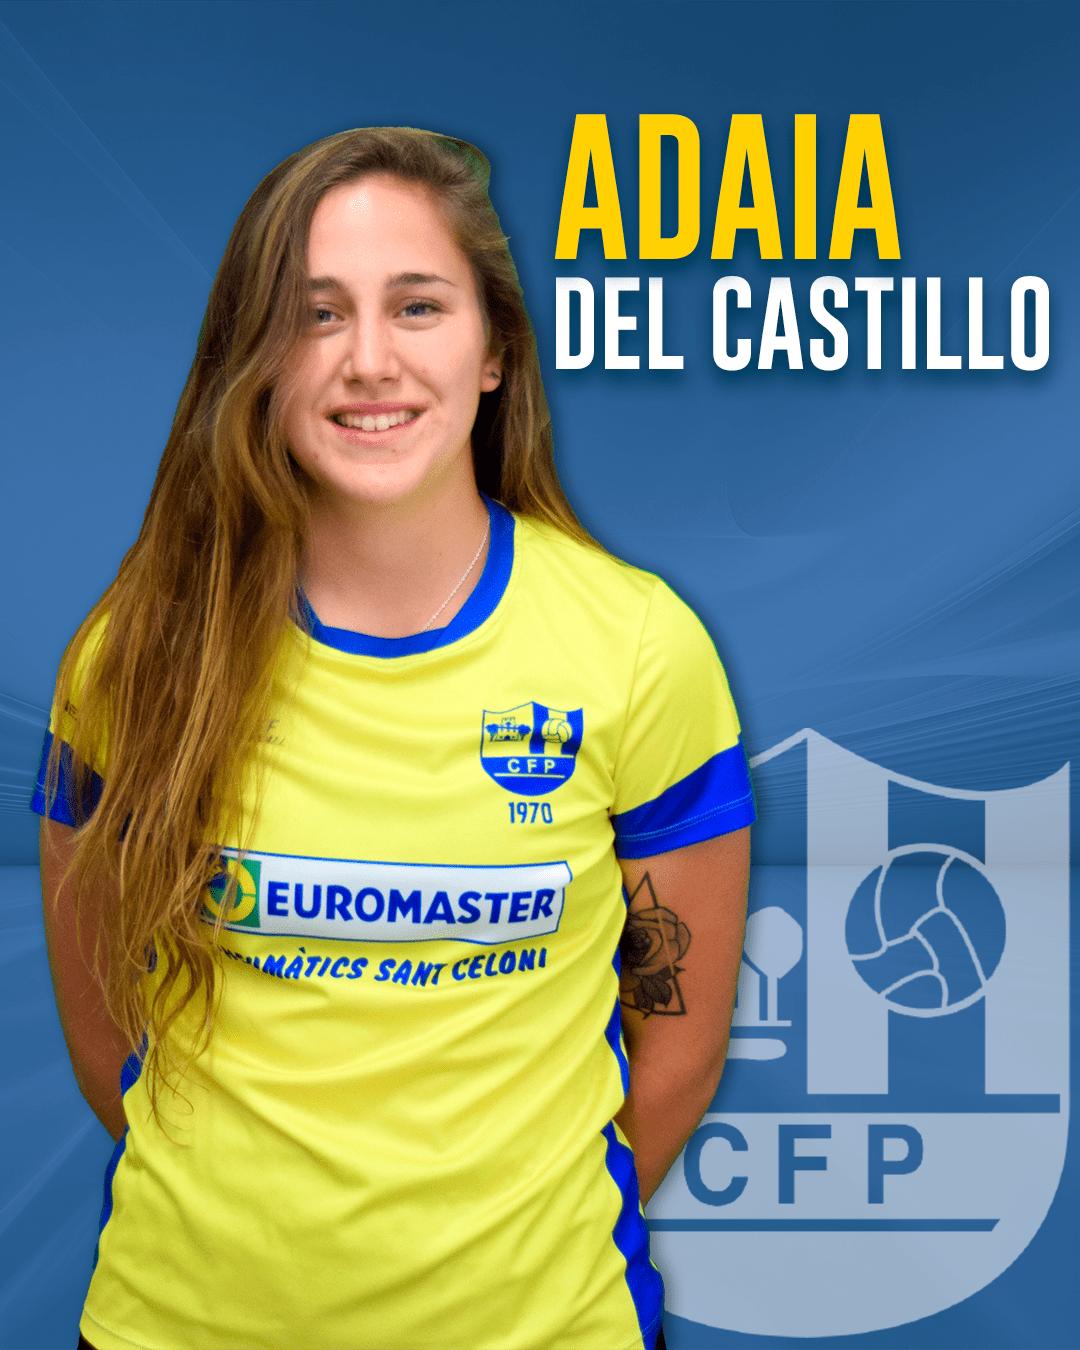 Adaia del Castillo